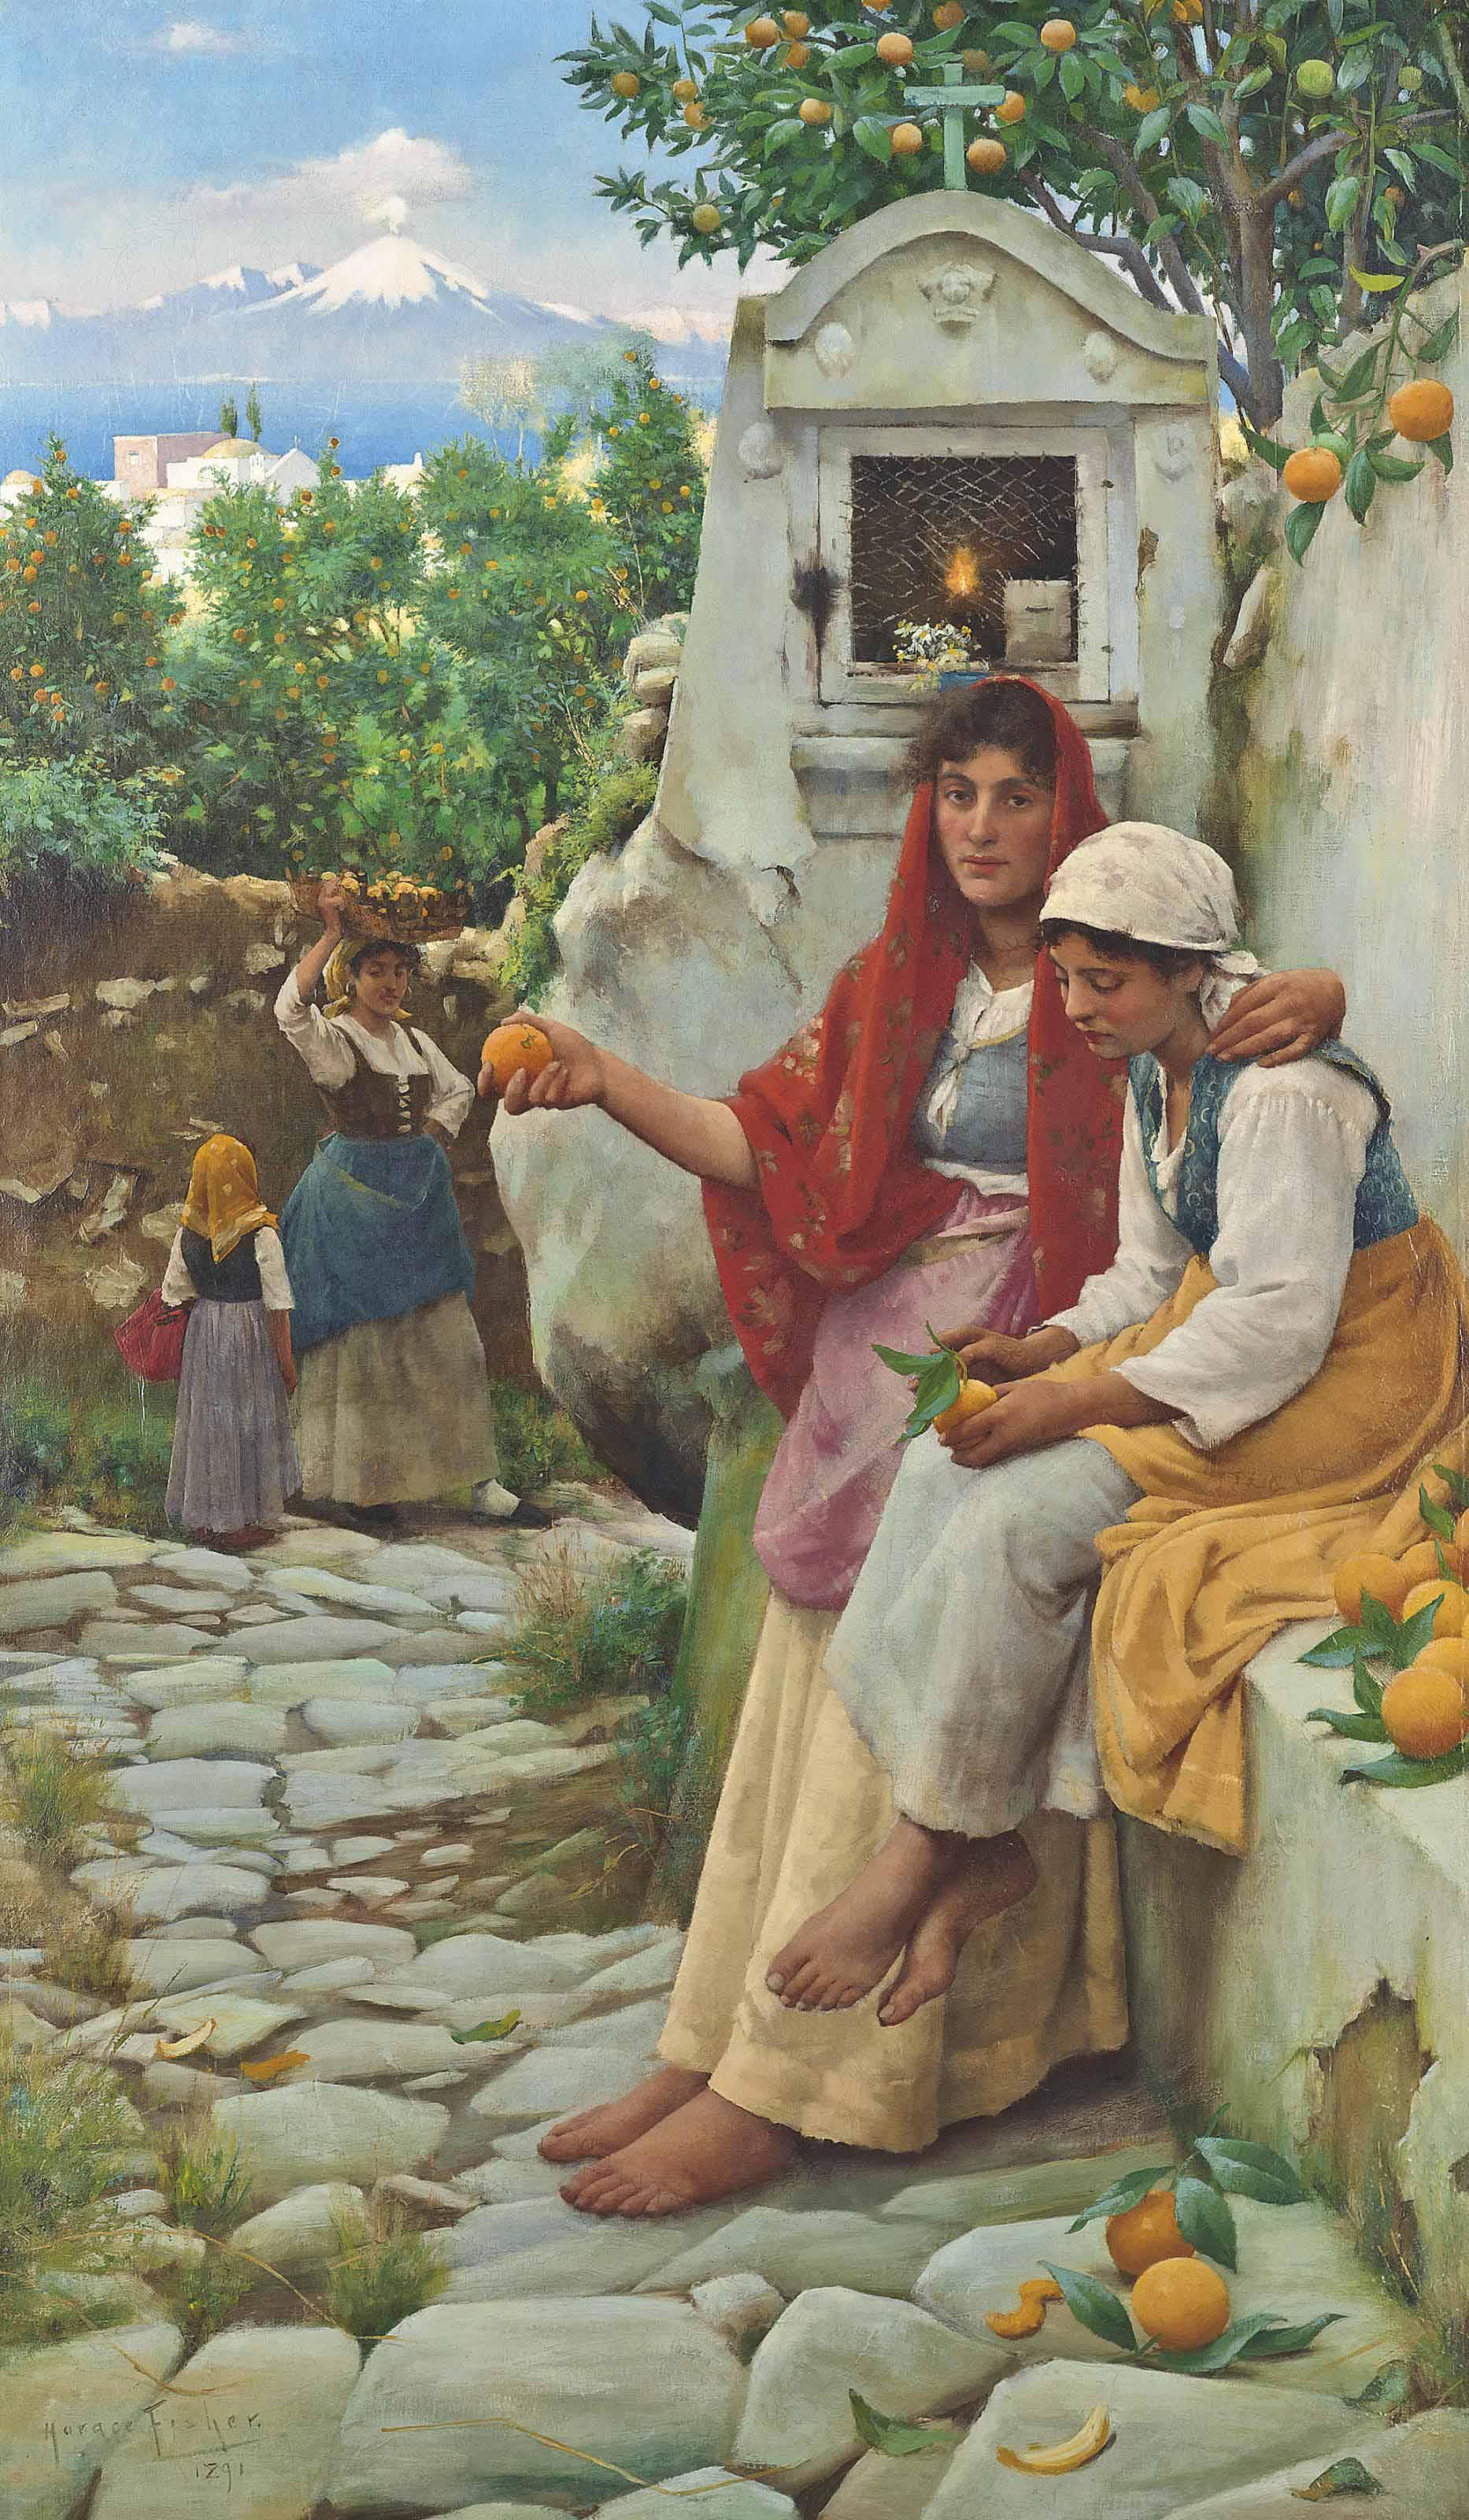 The orange sellers